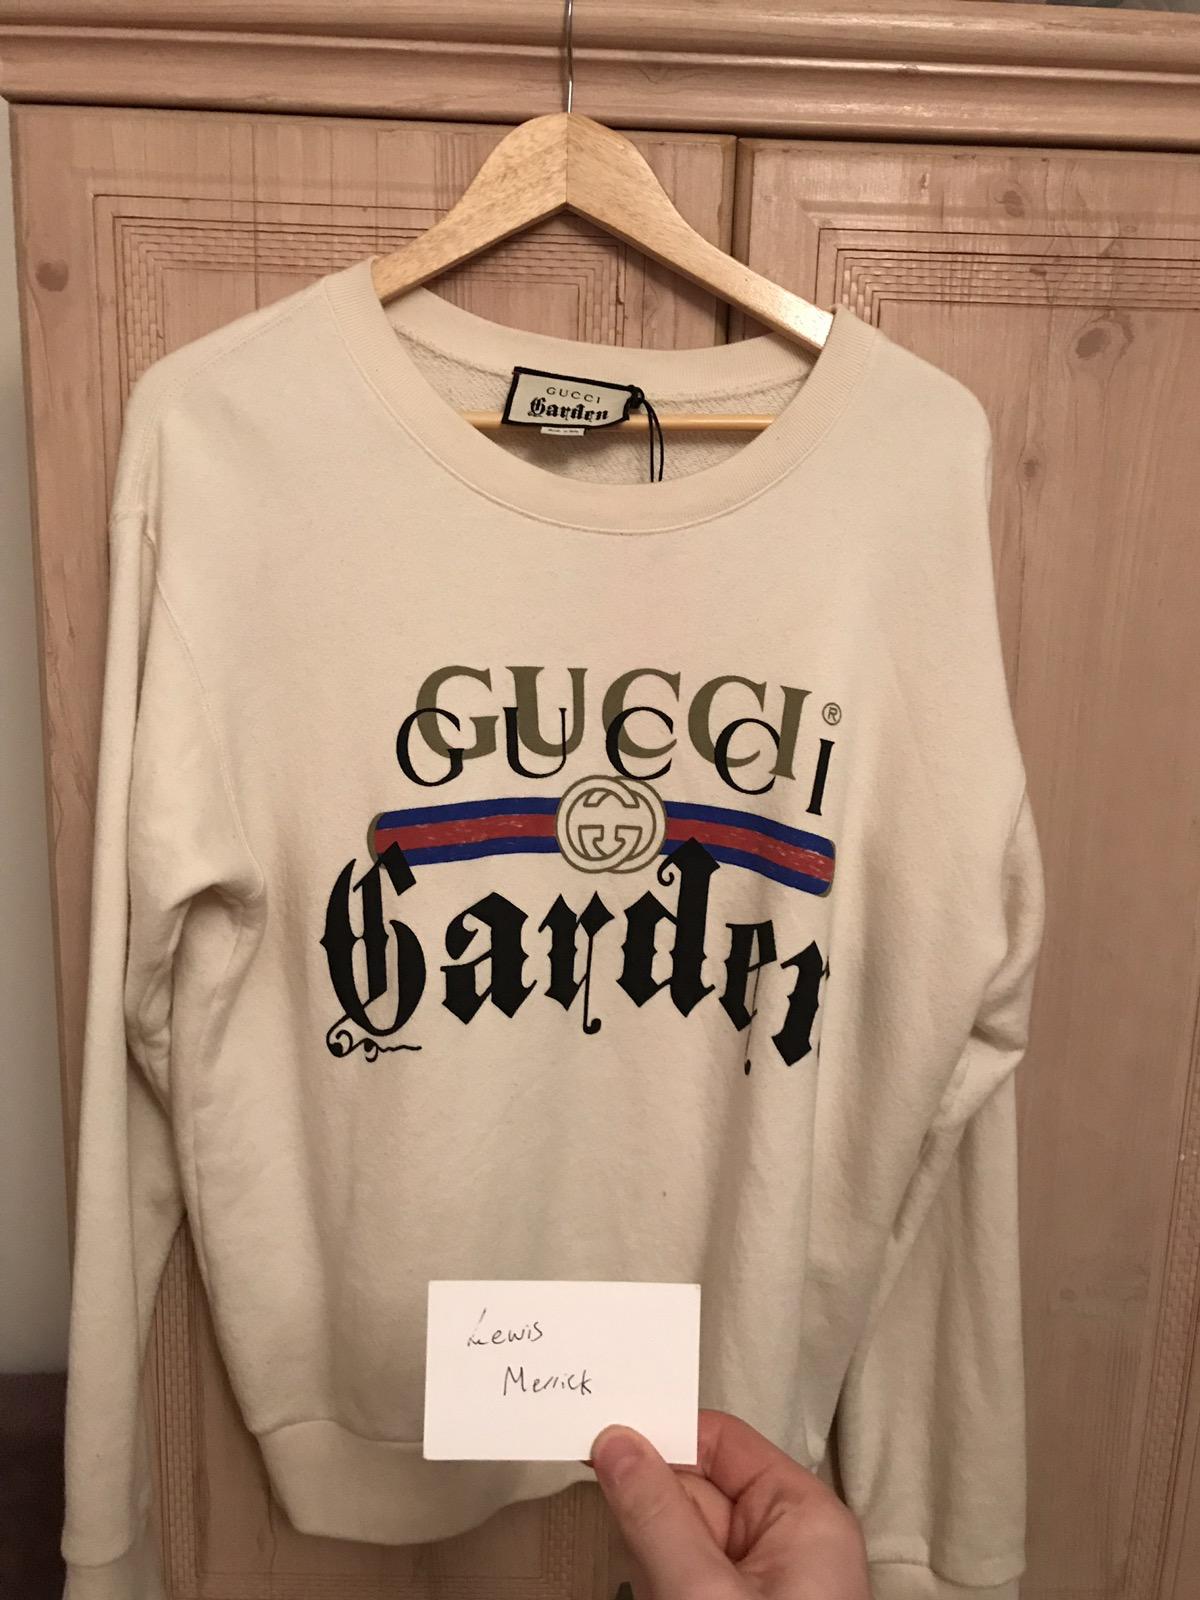 762c0843e0d1 Gucci Gucci Garden Sweatshirt | Grailed